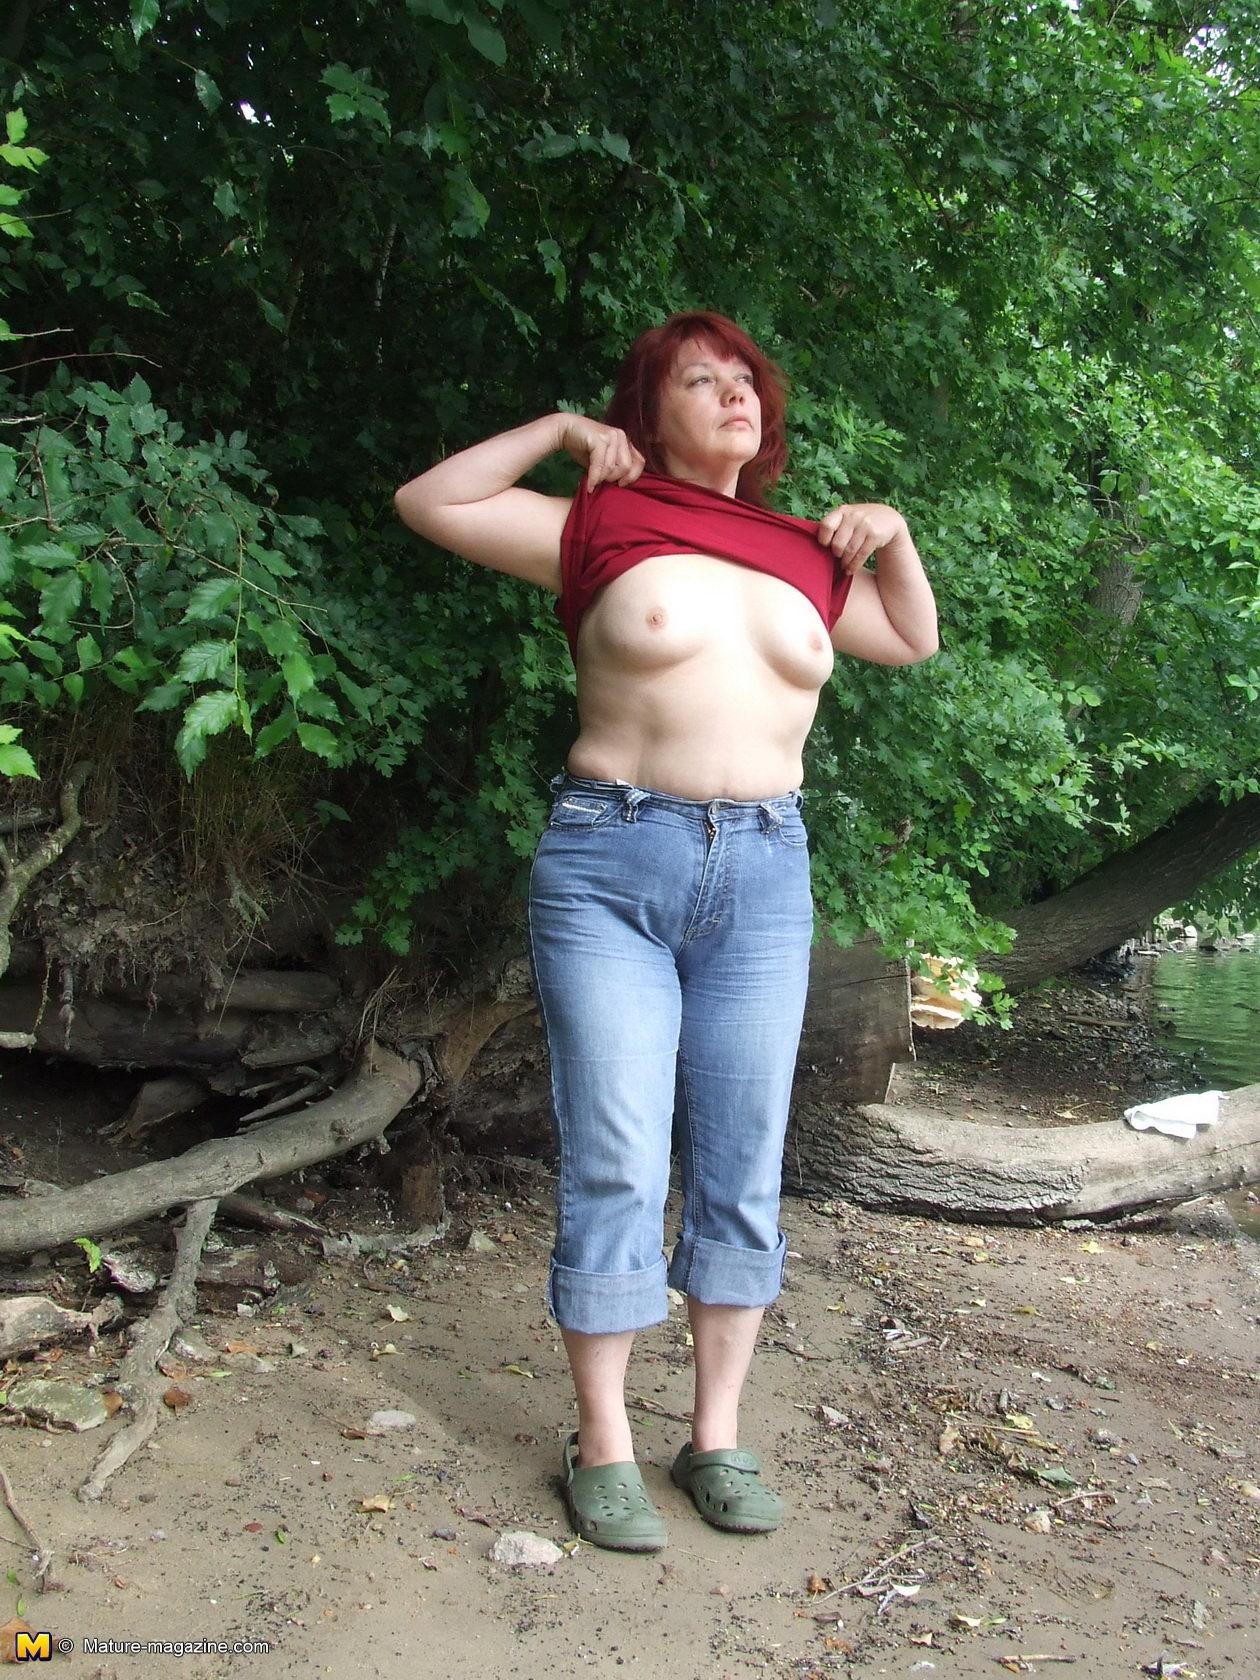 Free bondage video hot girls